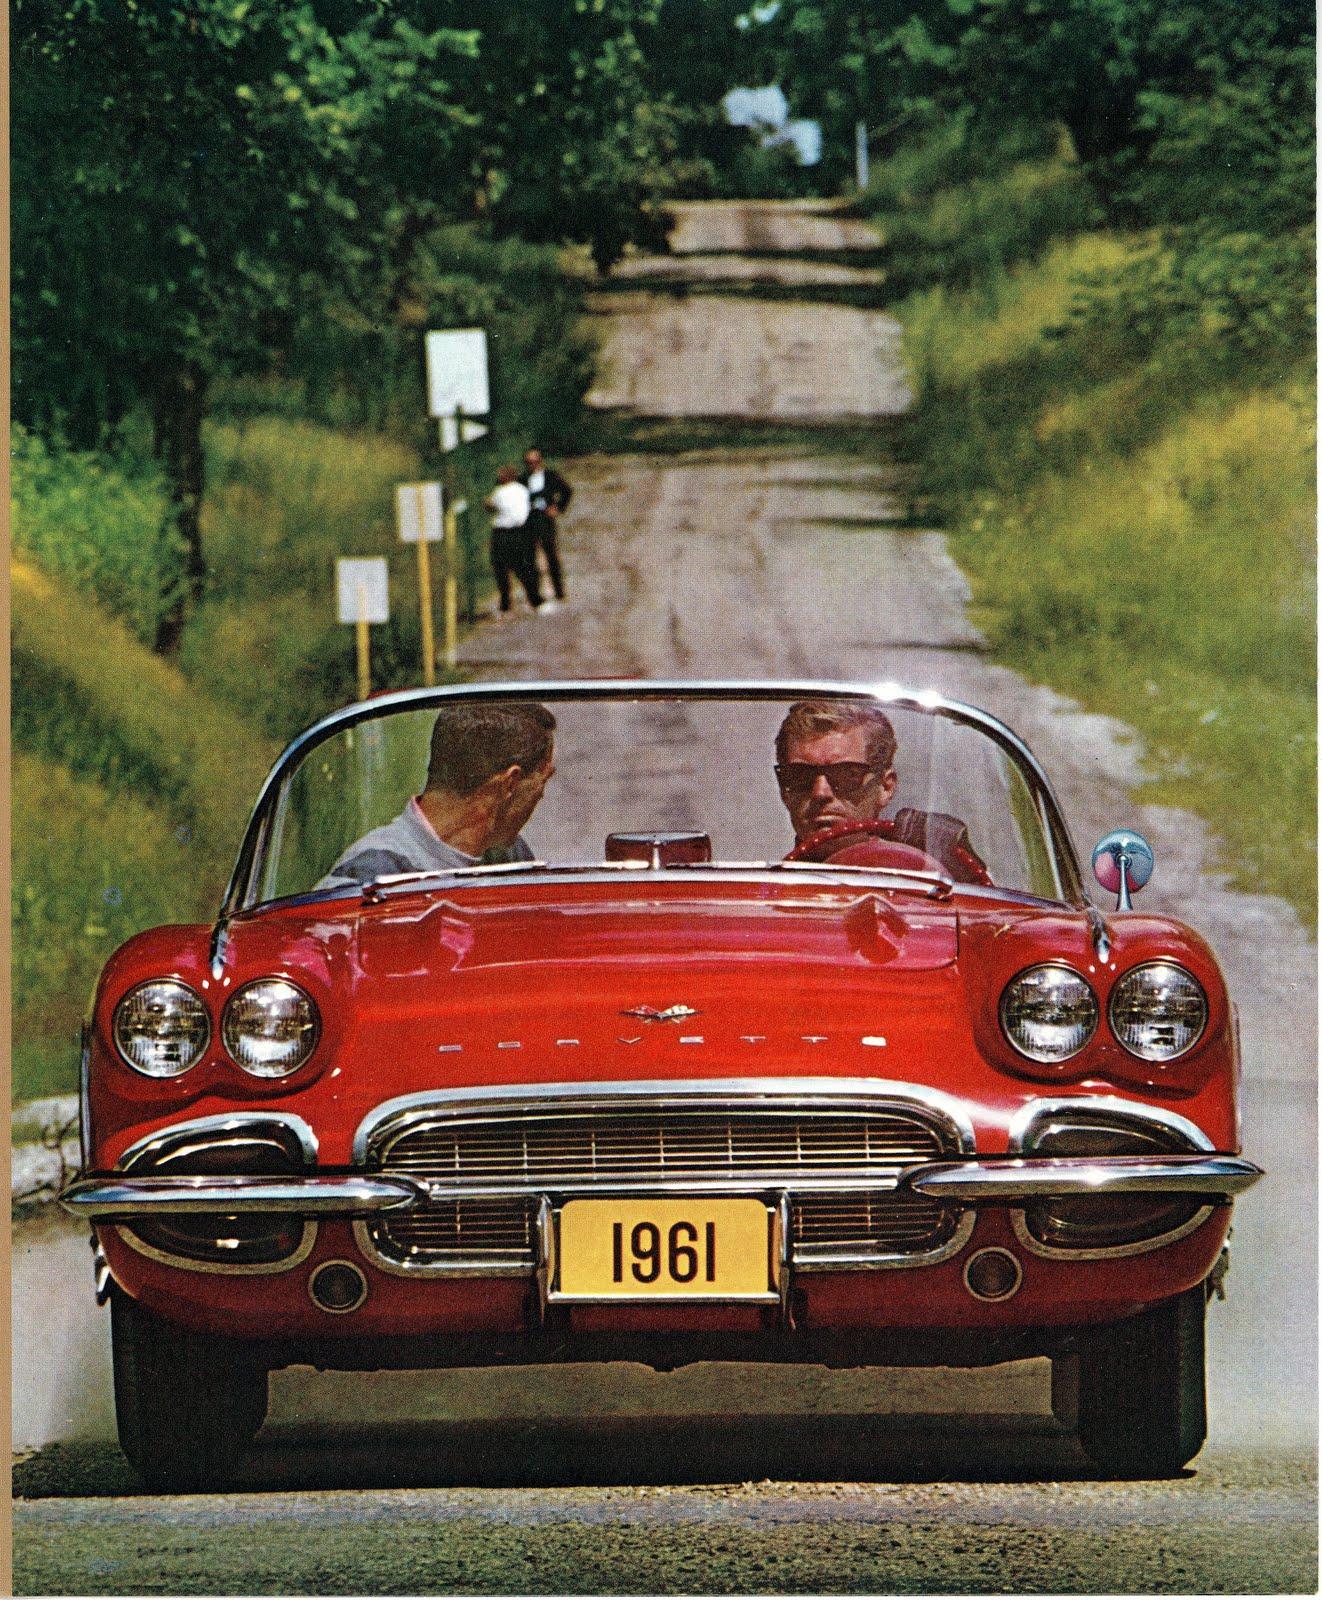 ['61+Corvette+Catalog-Front]